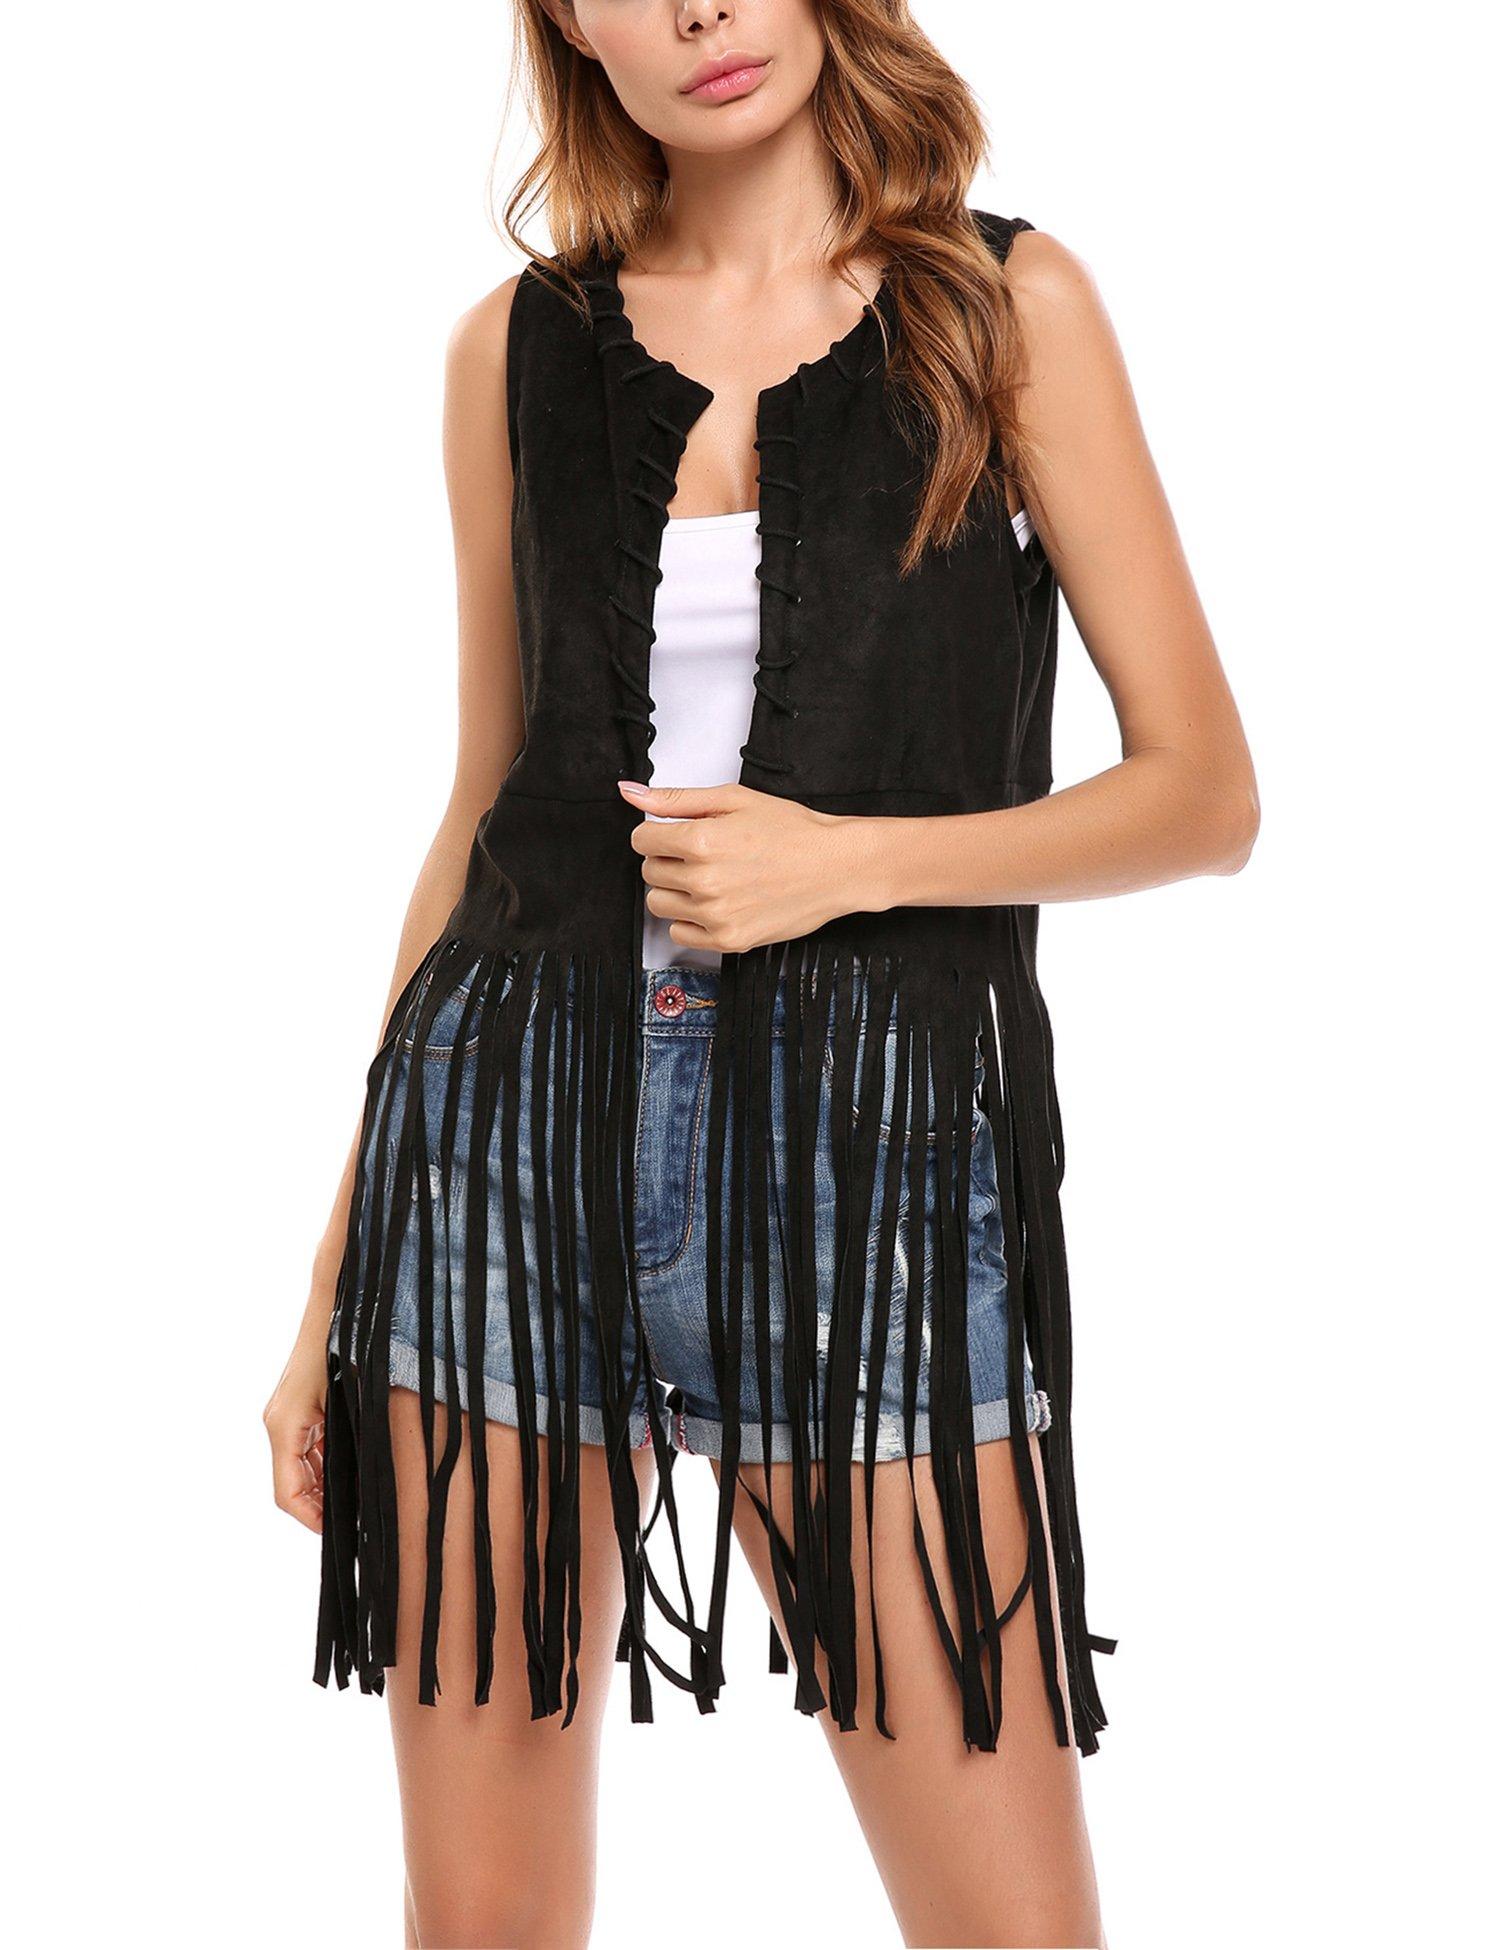 Hotouch Women's Black Faux Suede Hem Sleeveless Vest Waistcoat Cardigan(Black S)